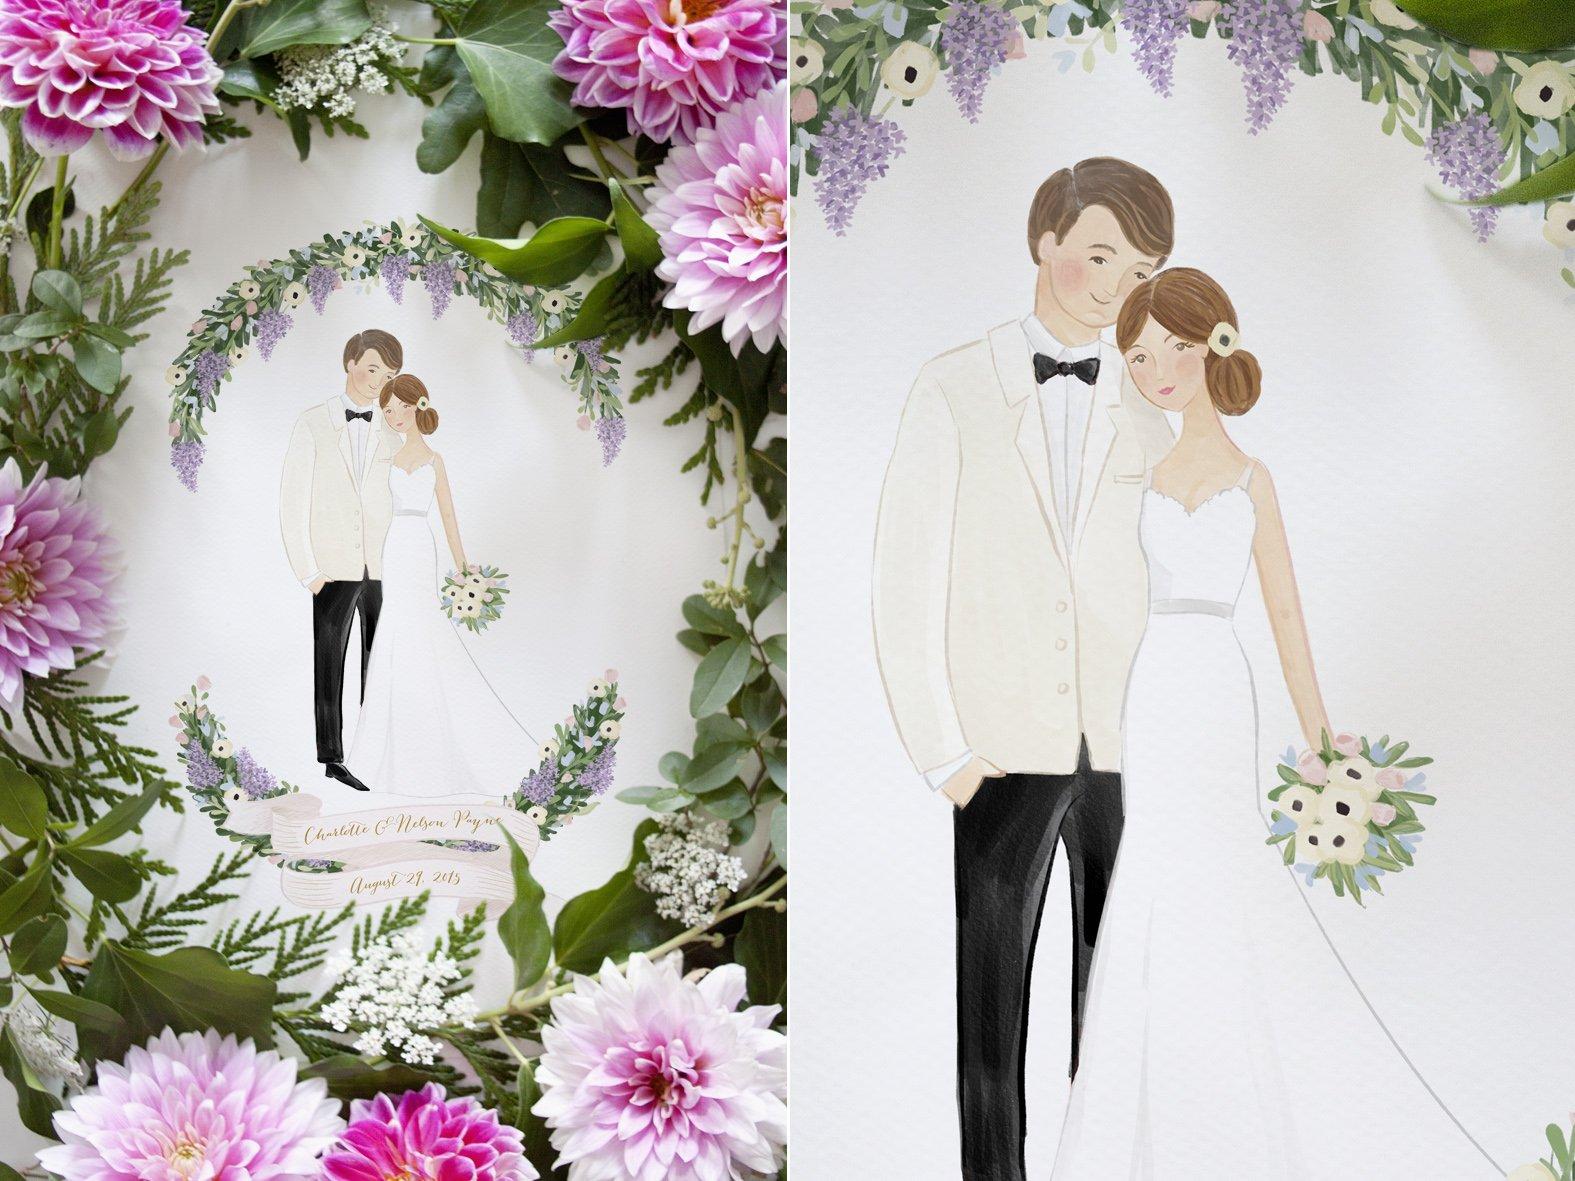 Custom Couple Illustration Valentine Wedding Engagement Anniversary Gift Idea by Belle Pivoine